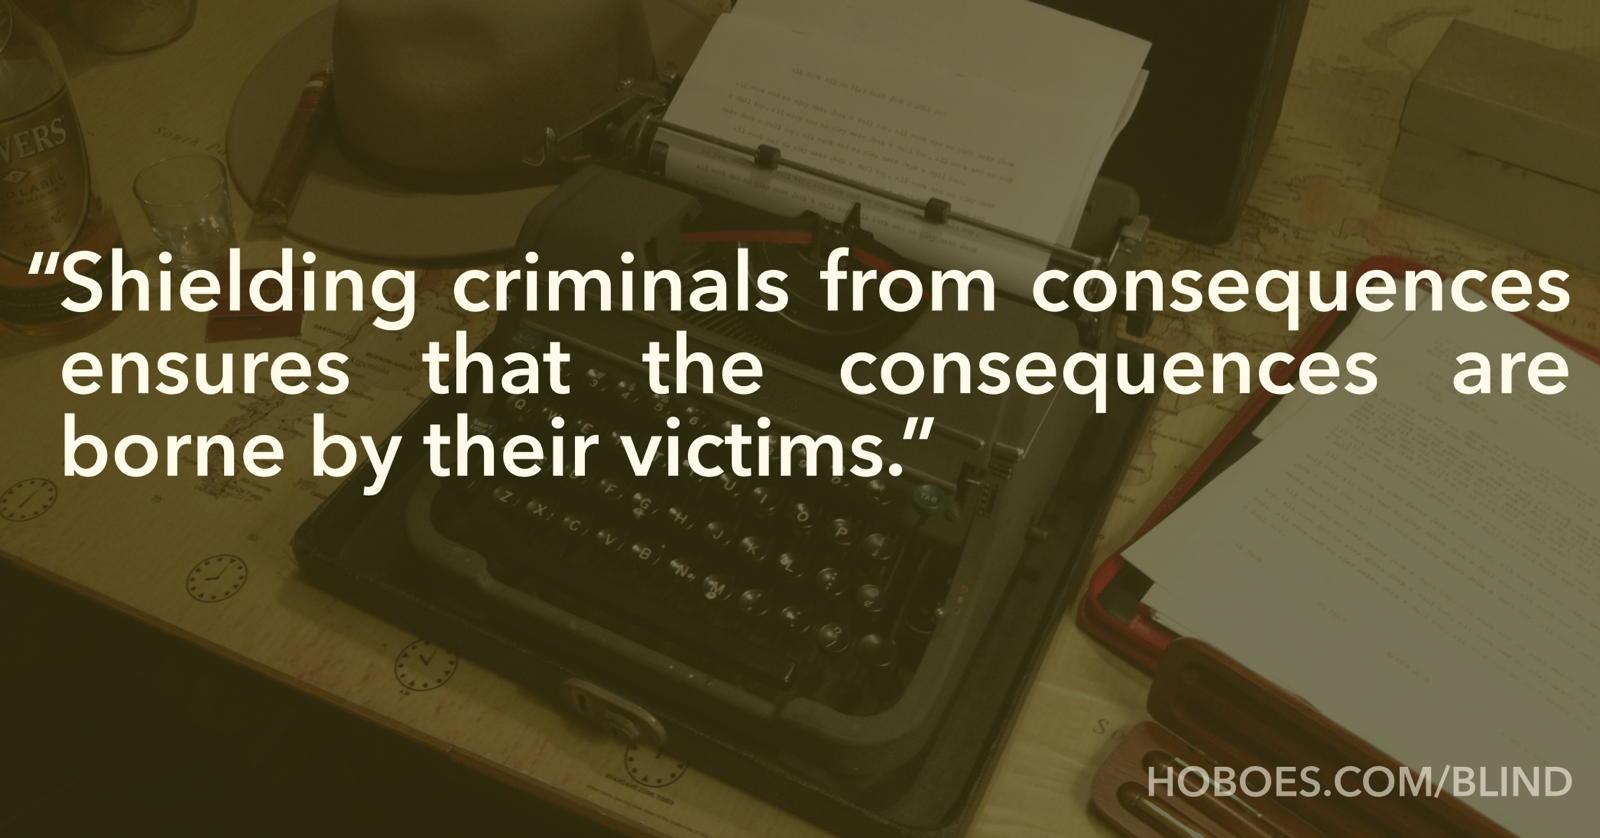 Shielding criminals